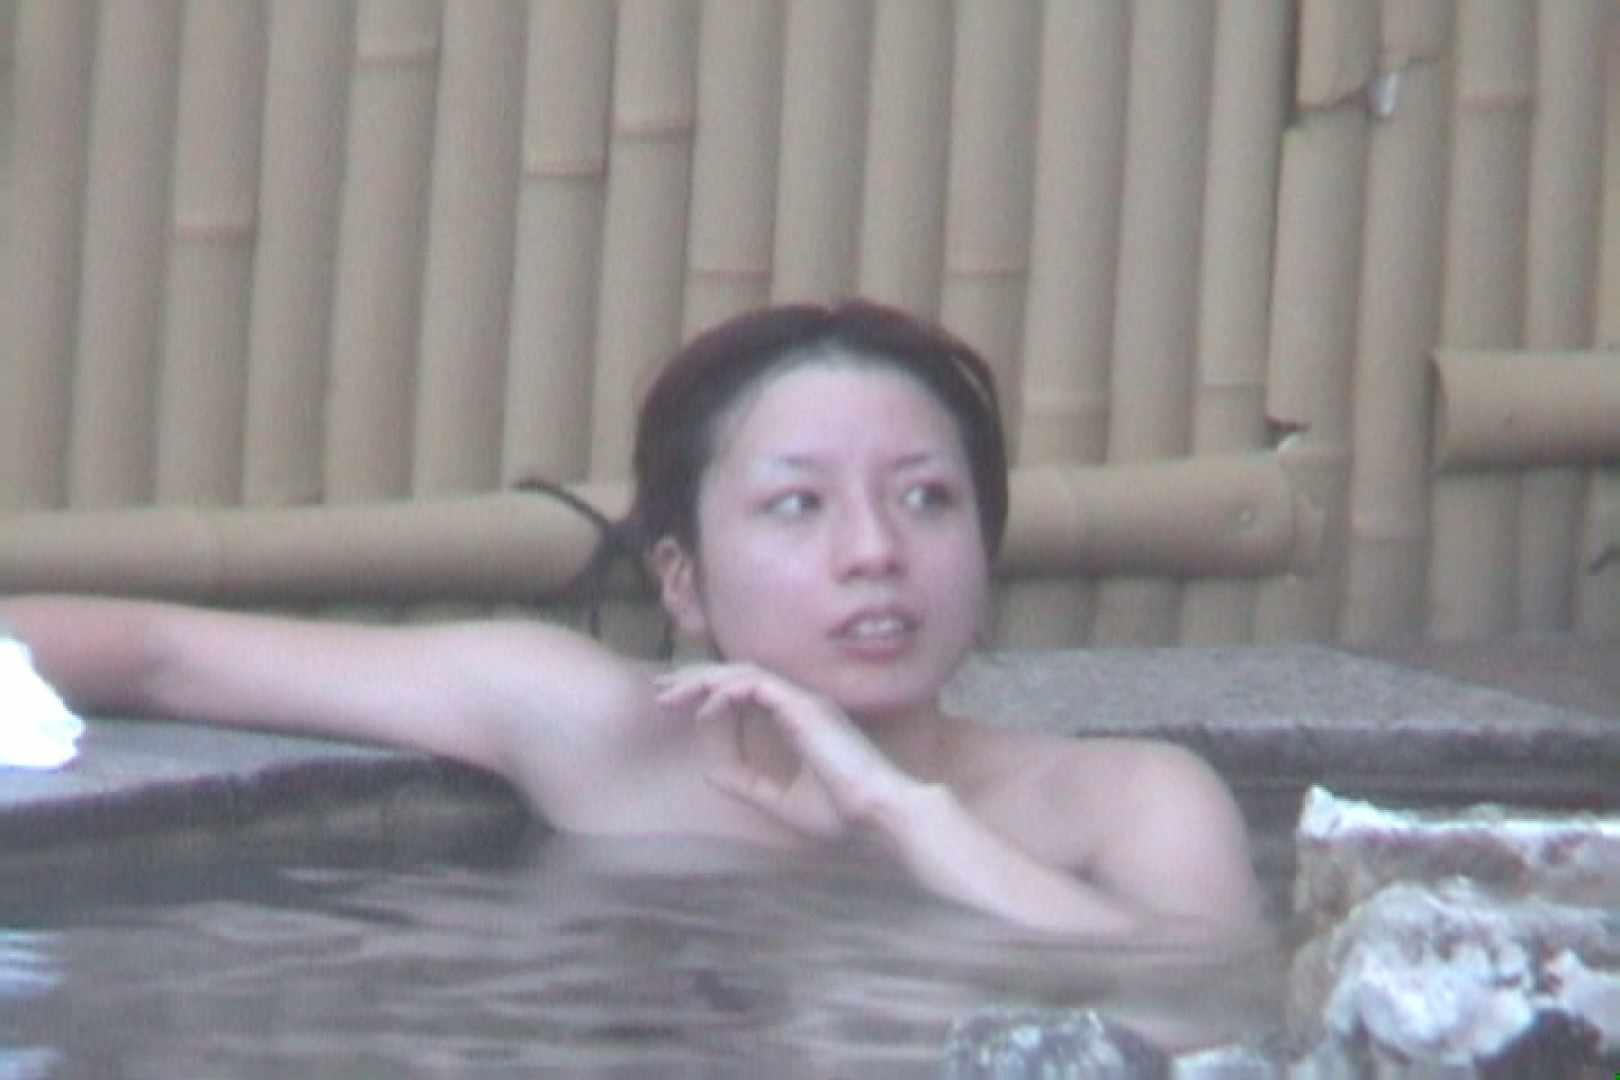 Aquaな露天風呂Vol.608 HなOL | 盗撮  89pic 67